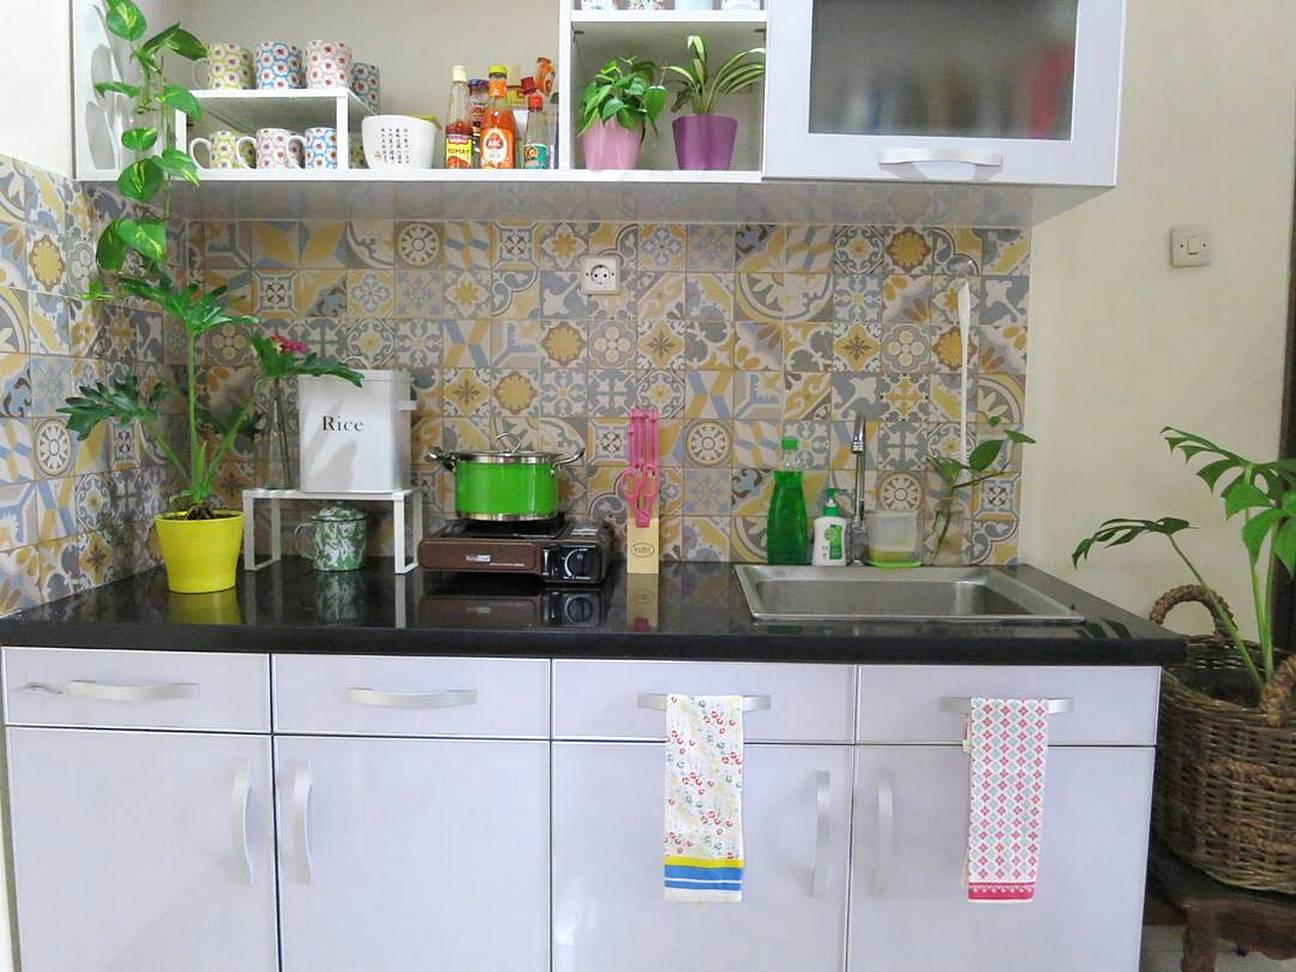 Warna Keramik Dapur Cantik Untuk Dinding Minimalis Anda